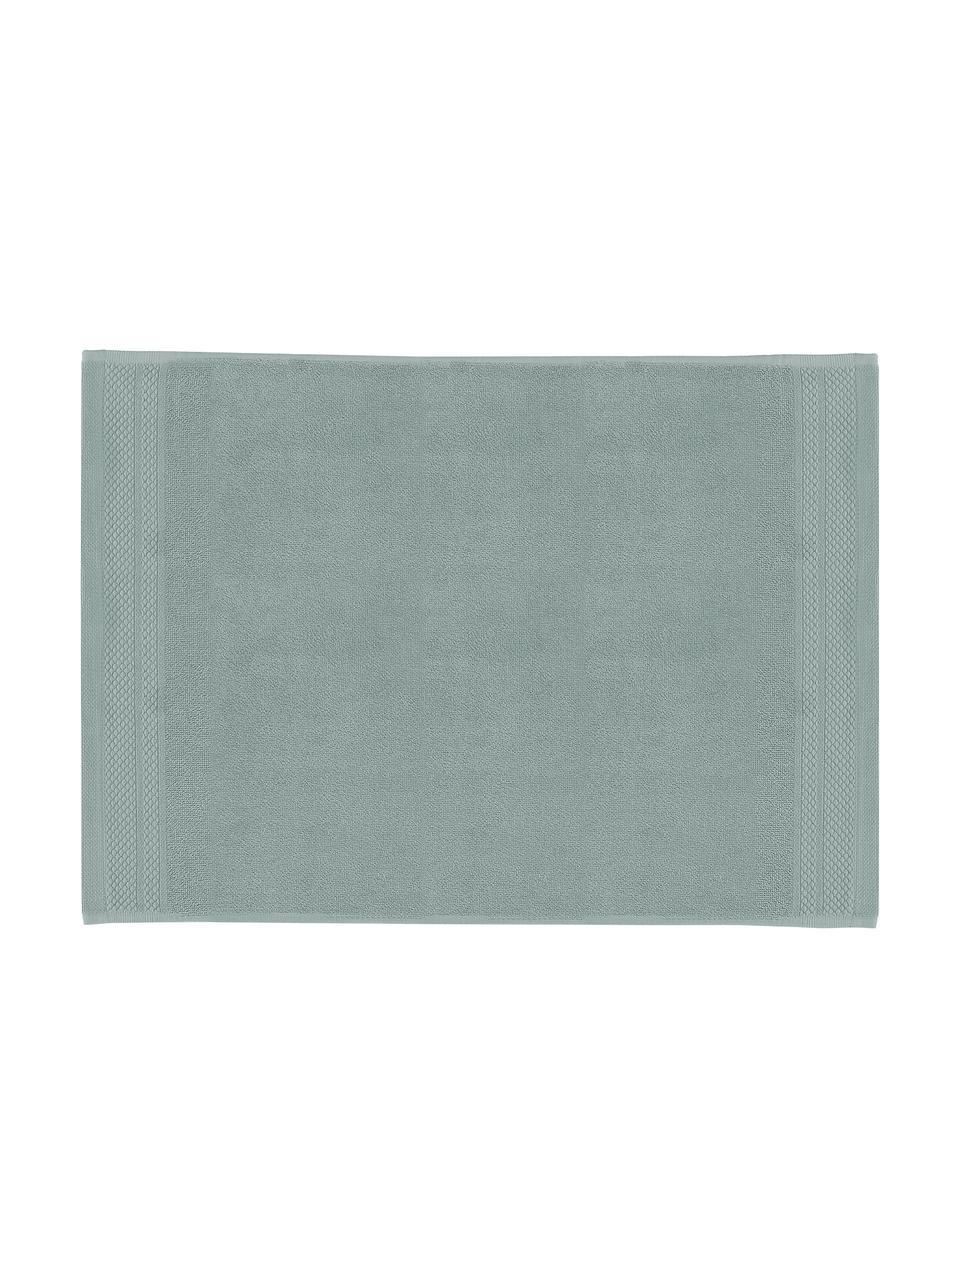 Tappeto bagno antiscivolo Premium, 100% cotone, qualità pesante 600g/m², Verde salvia, Larg. 50 x Lung. 70 cm